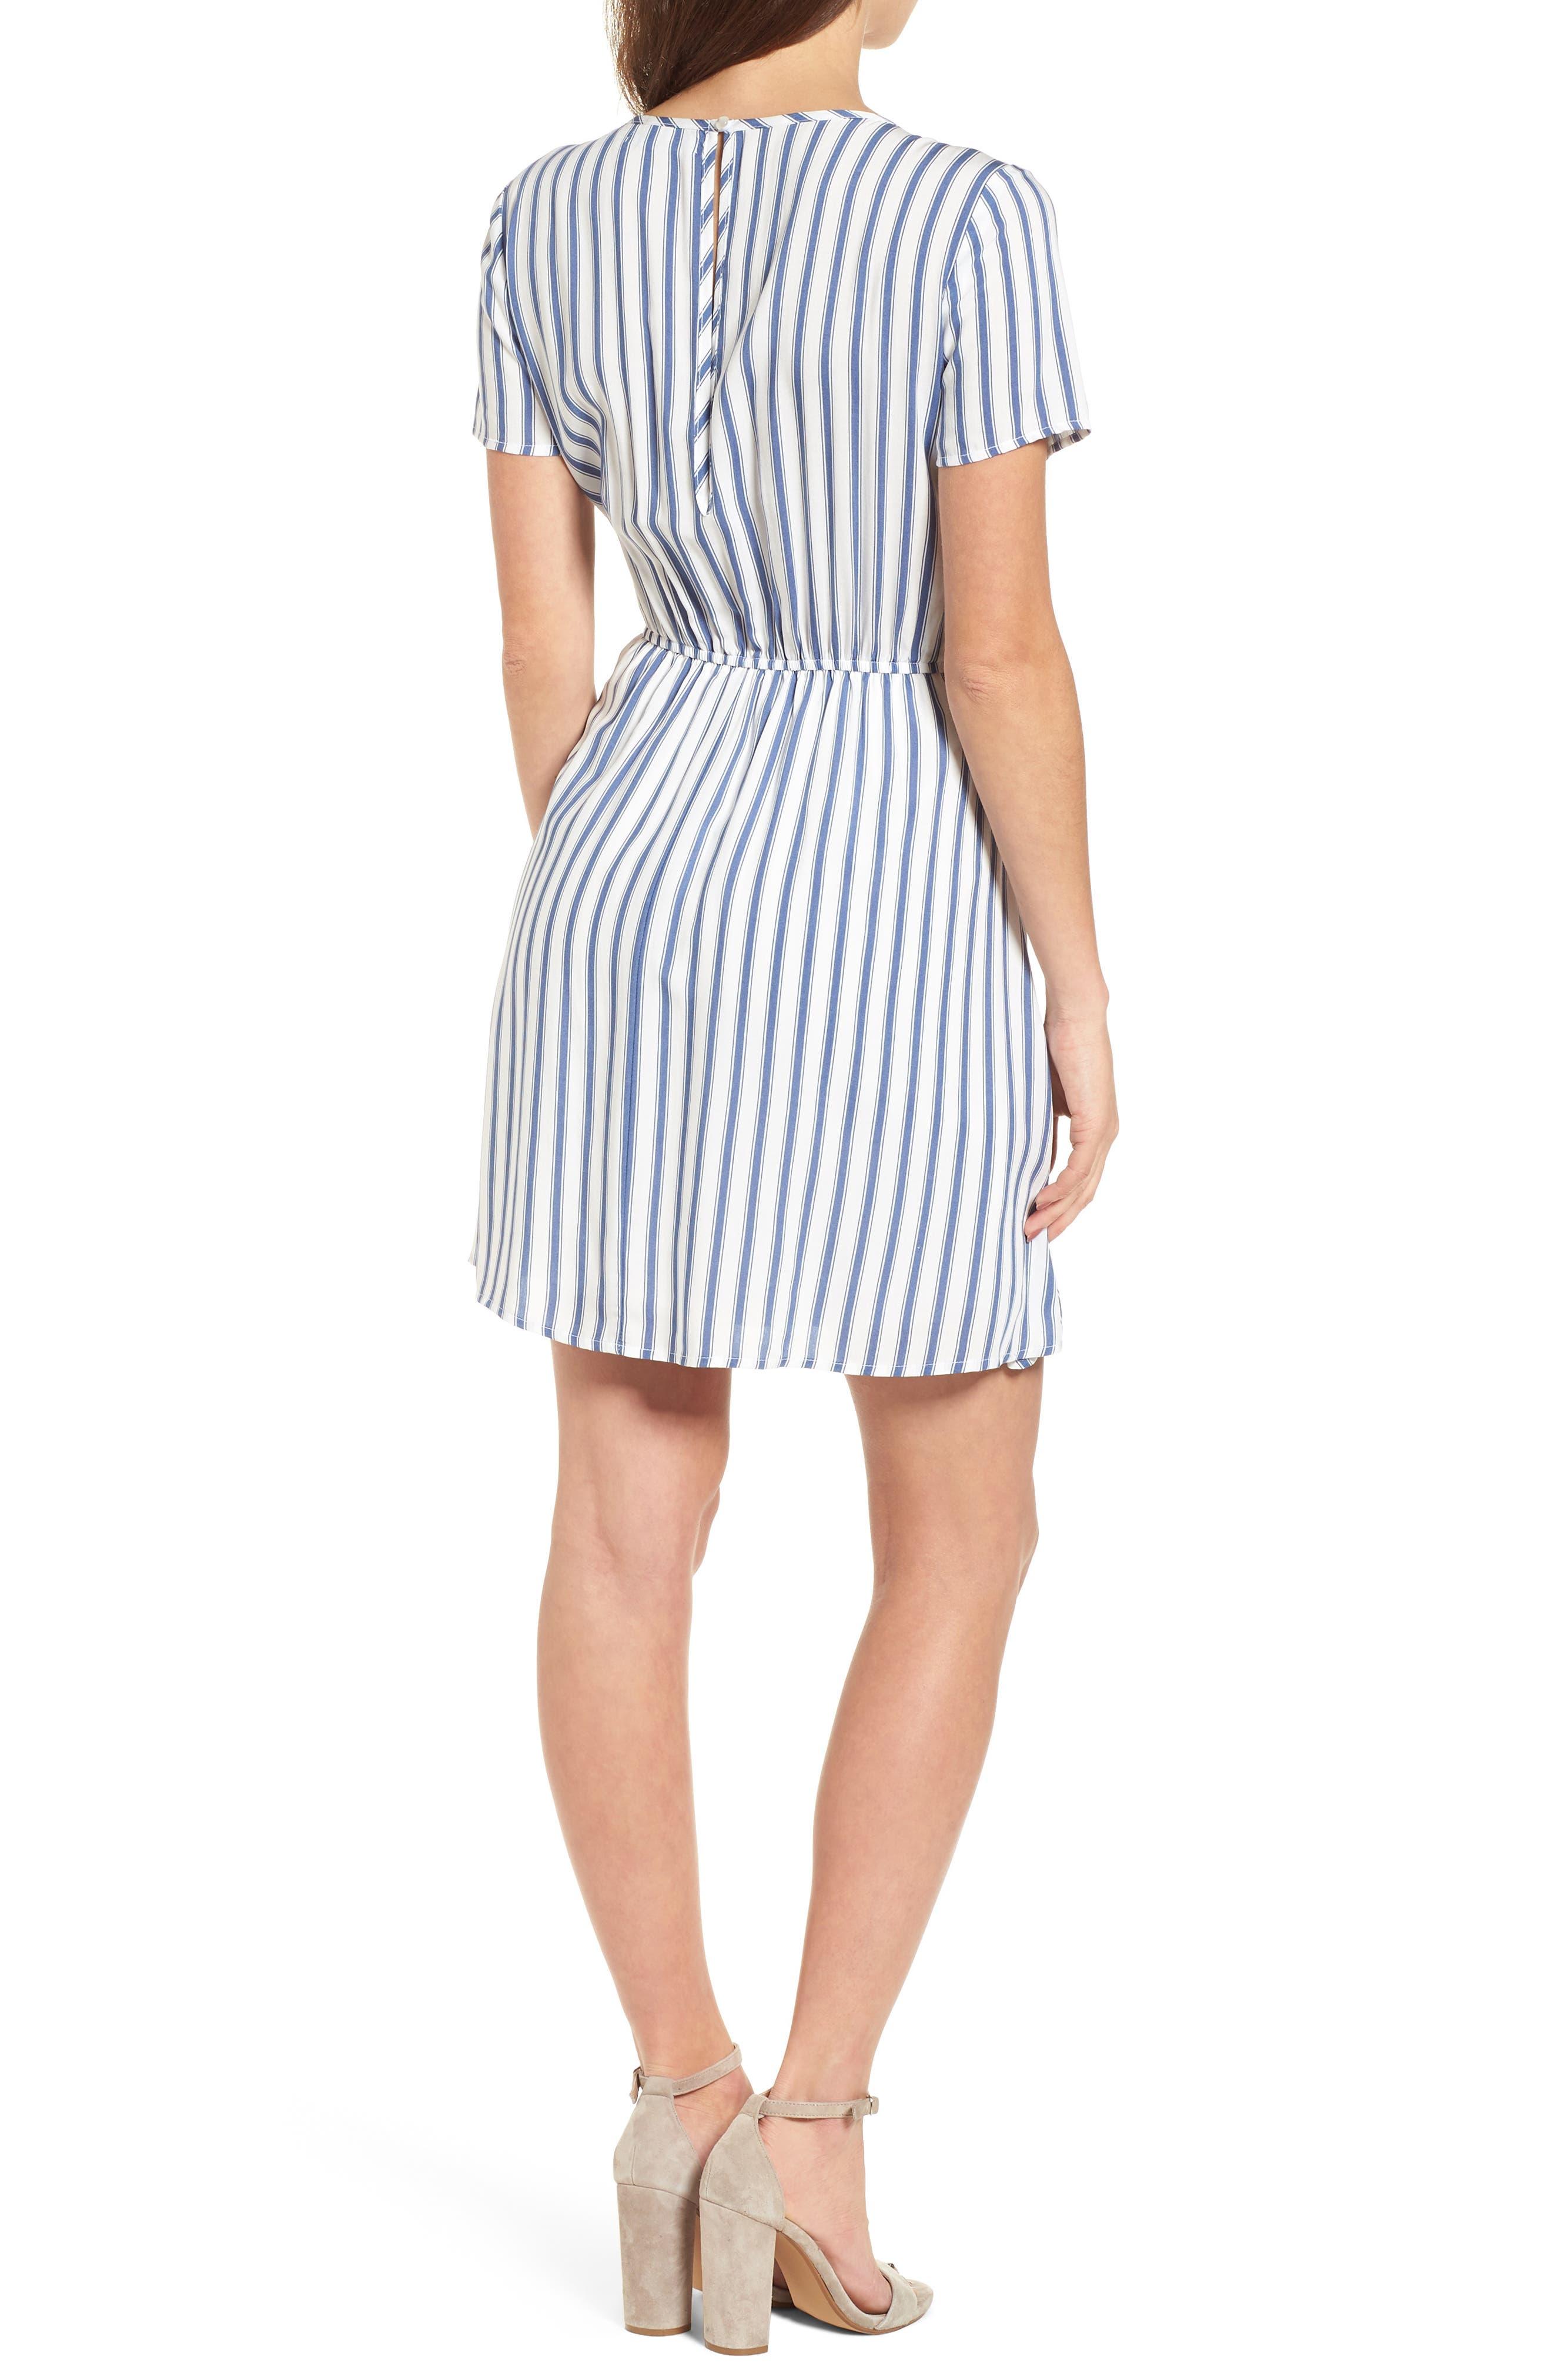 Cinch Front Minidress,                             Alternate thumbnail 2, color,                             Blue/ White Stripe